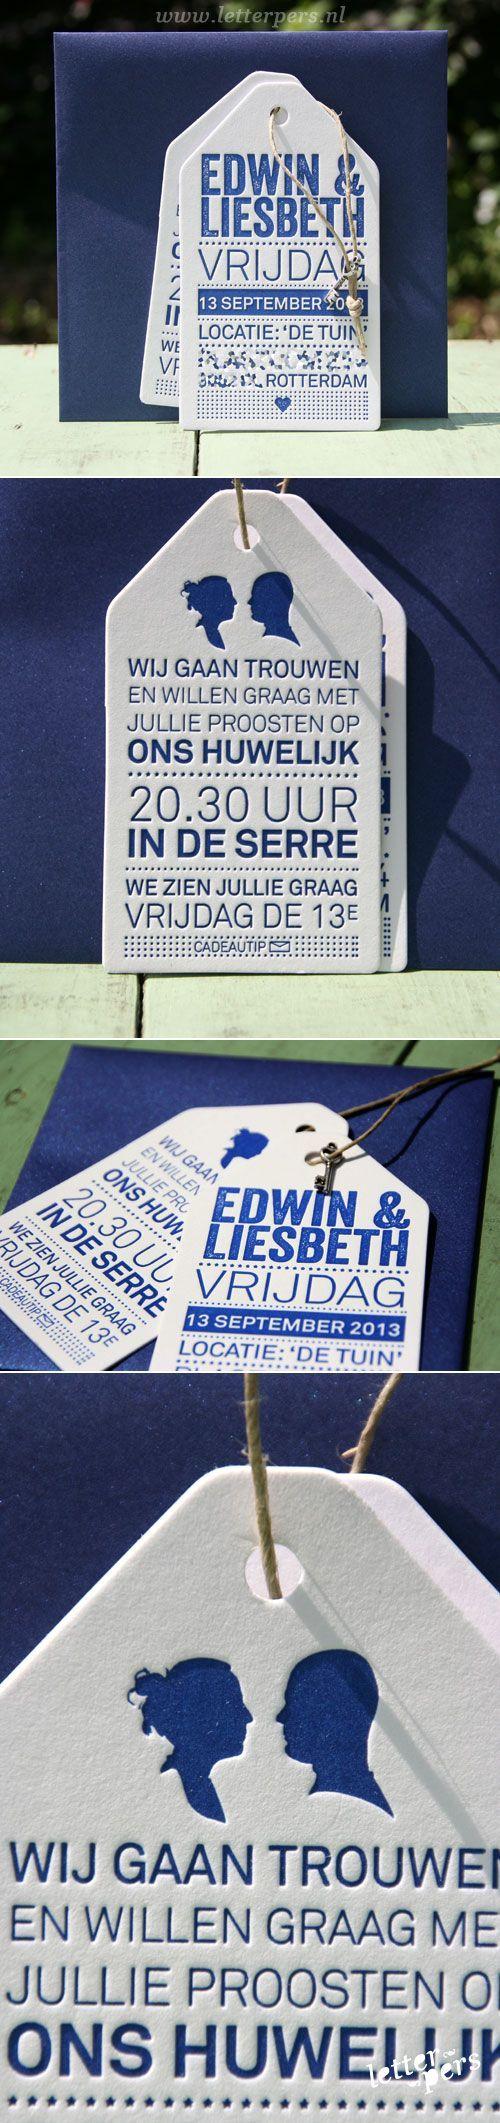 #Marriage #Invitation #Blue #Etiquette